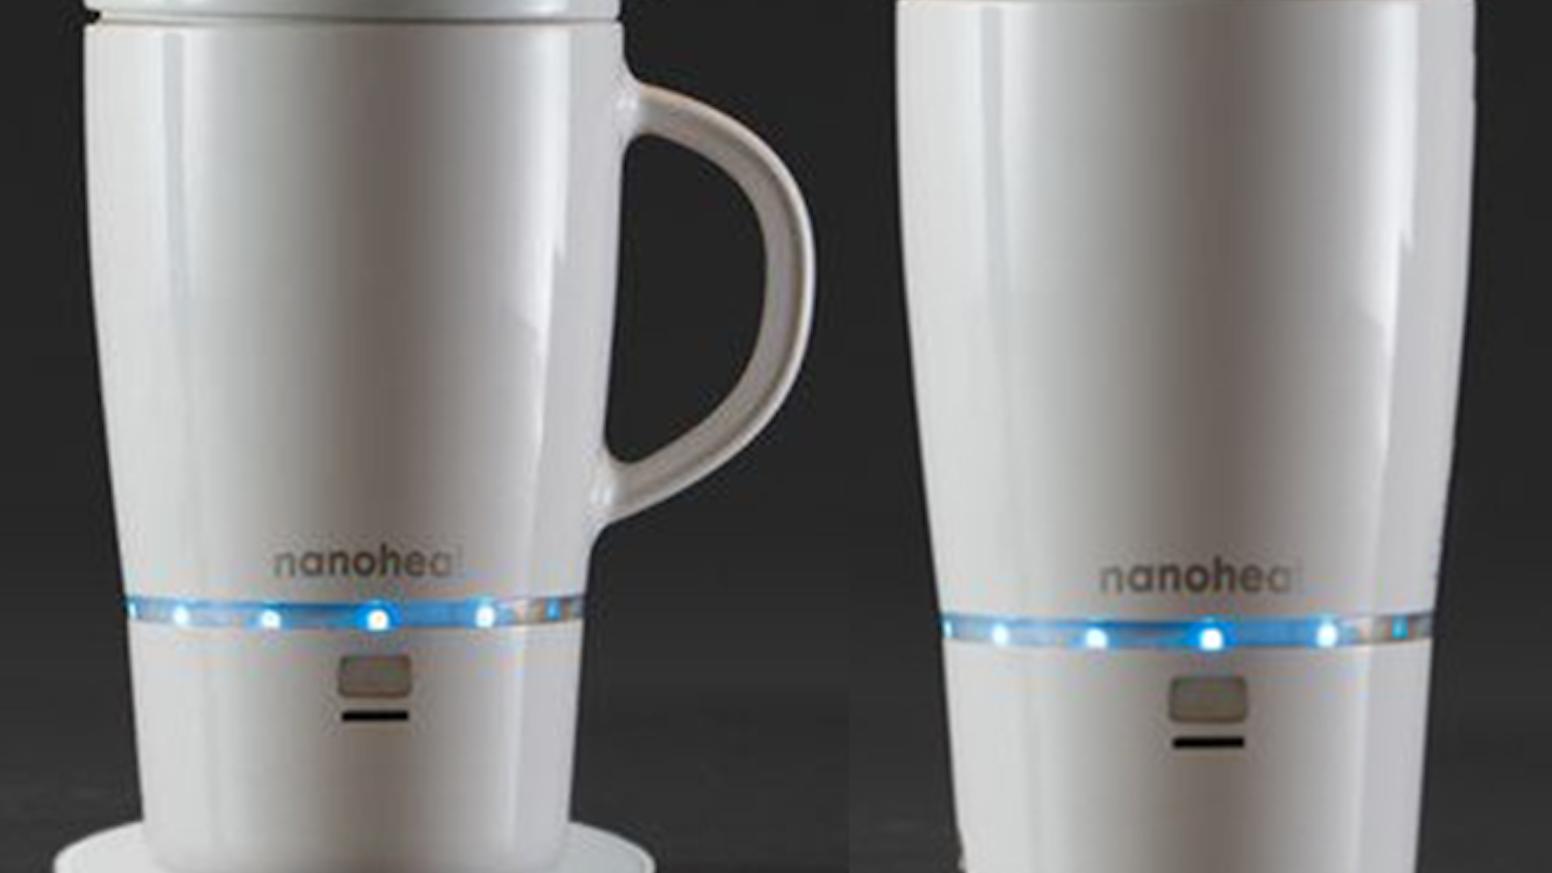 Wireless By Nano Llc Design And Hmi Green Mugcup Heated gbmI6vfY7y